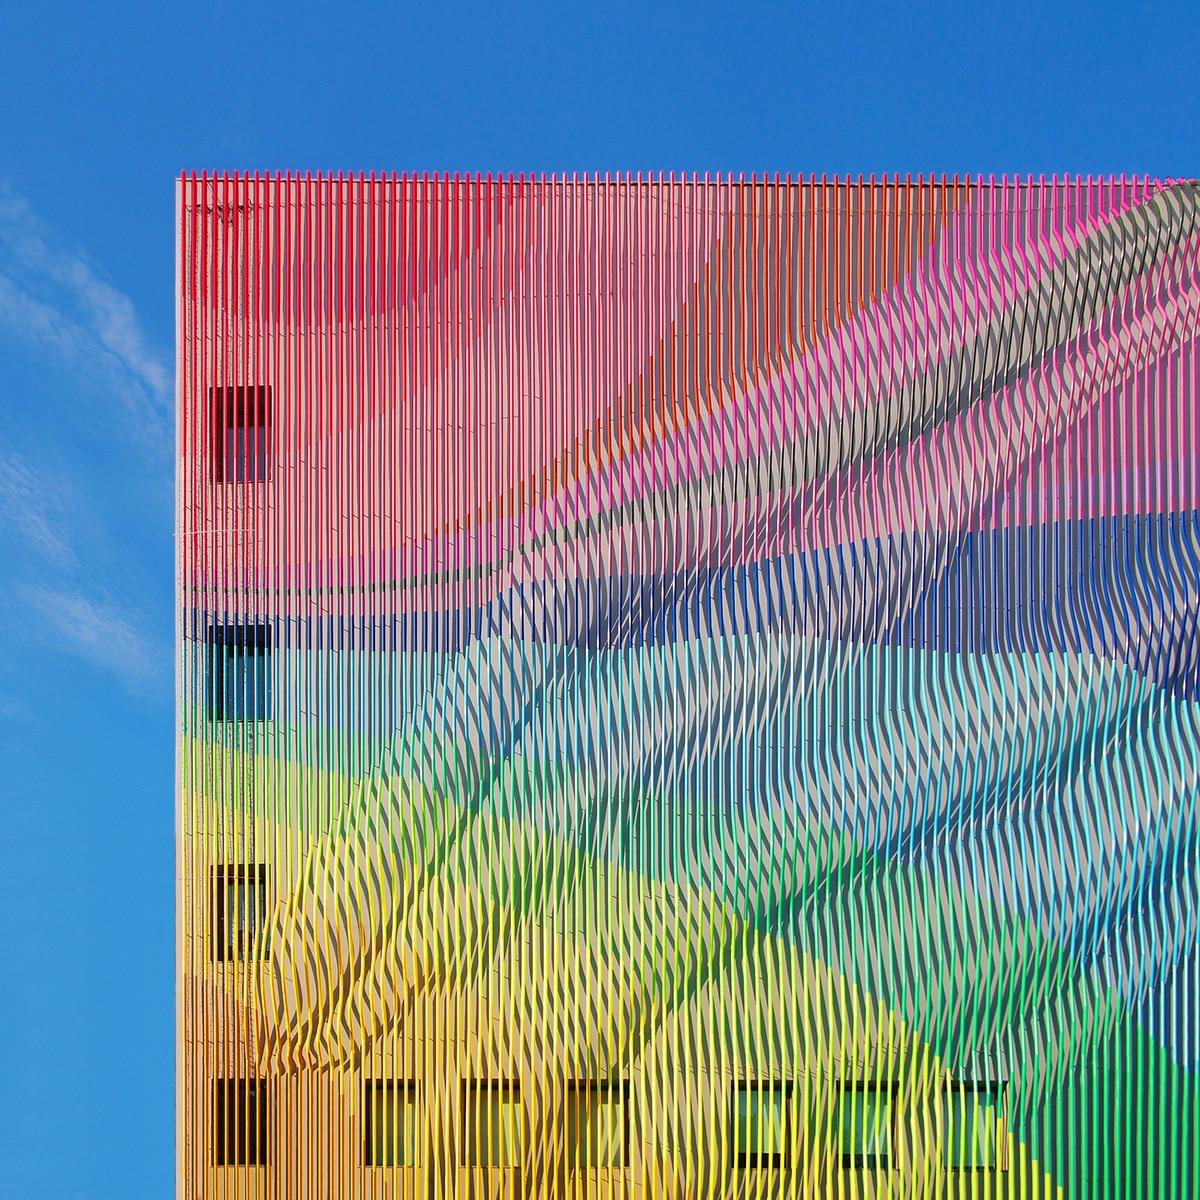 Yener Torun Ciudades arcoíris